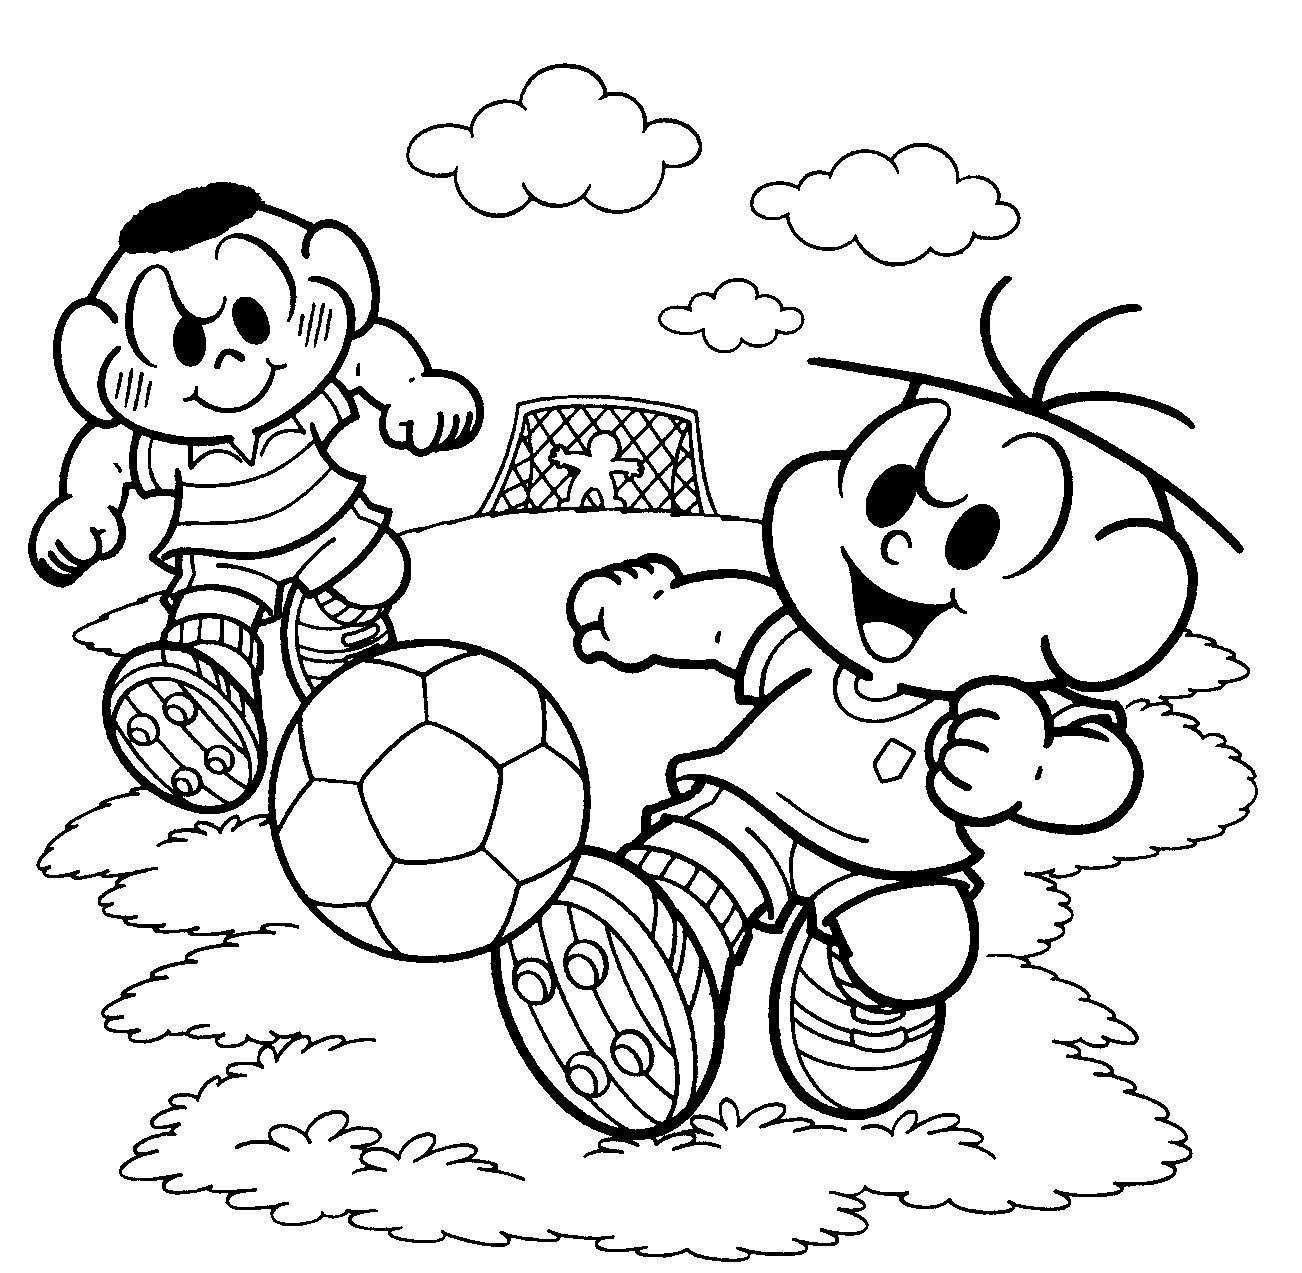 Desenhos Para Imprimir Meninos – Pampekids Net